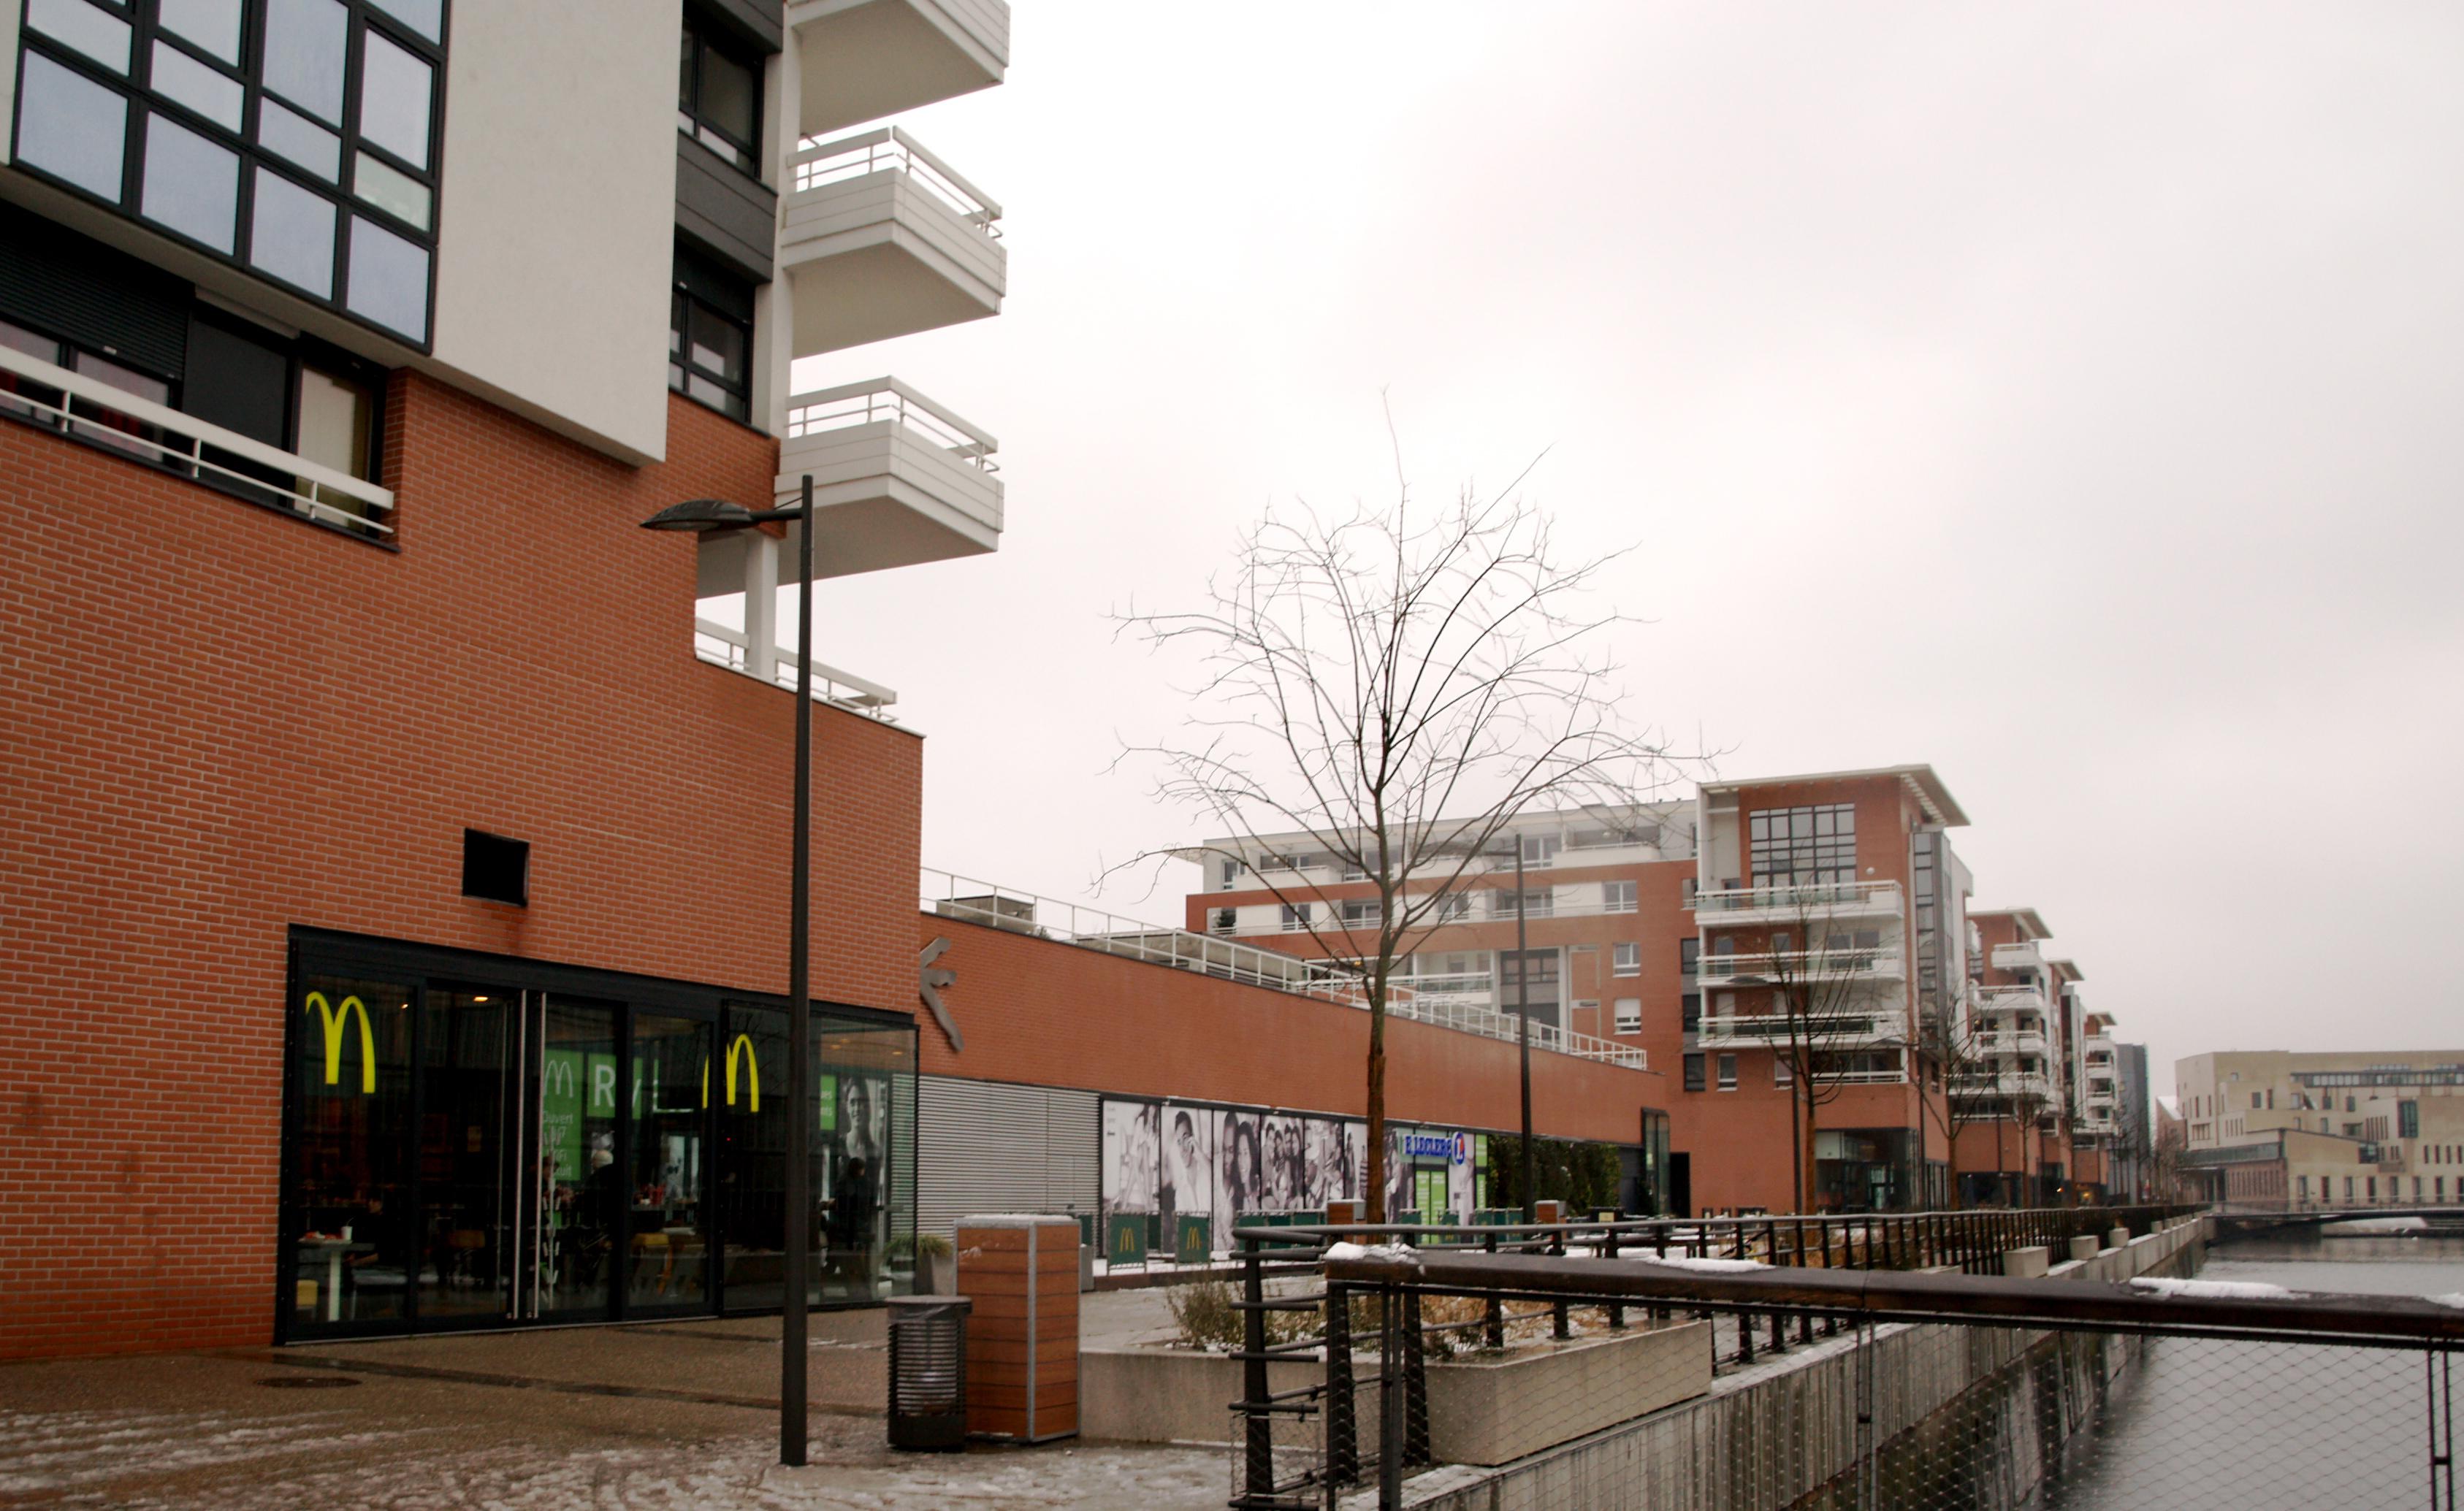 File riv toile c t jpg wikimedia commons - Centre commercial rivetoile strasbourg ...